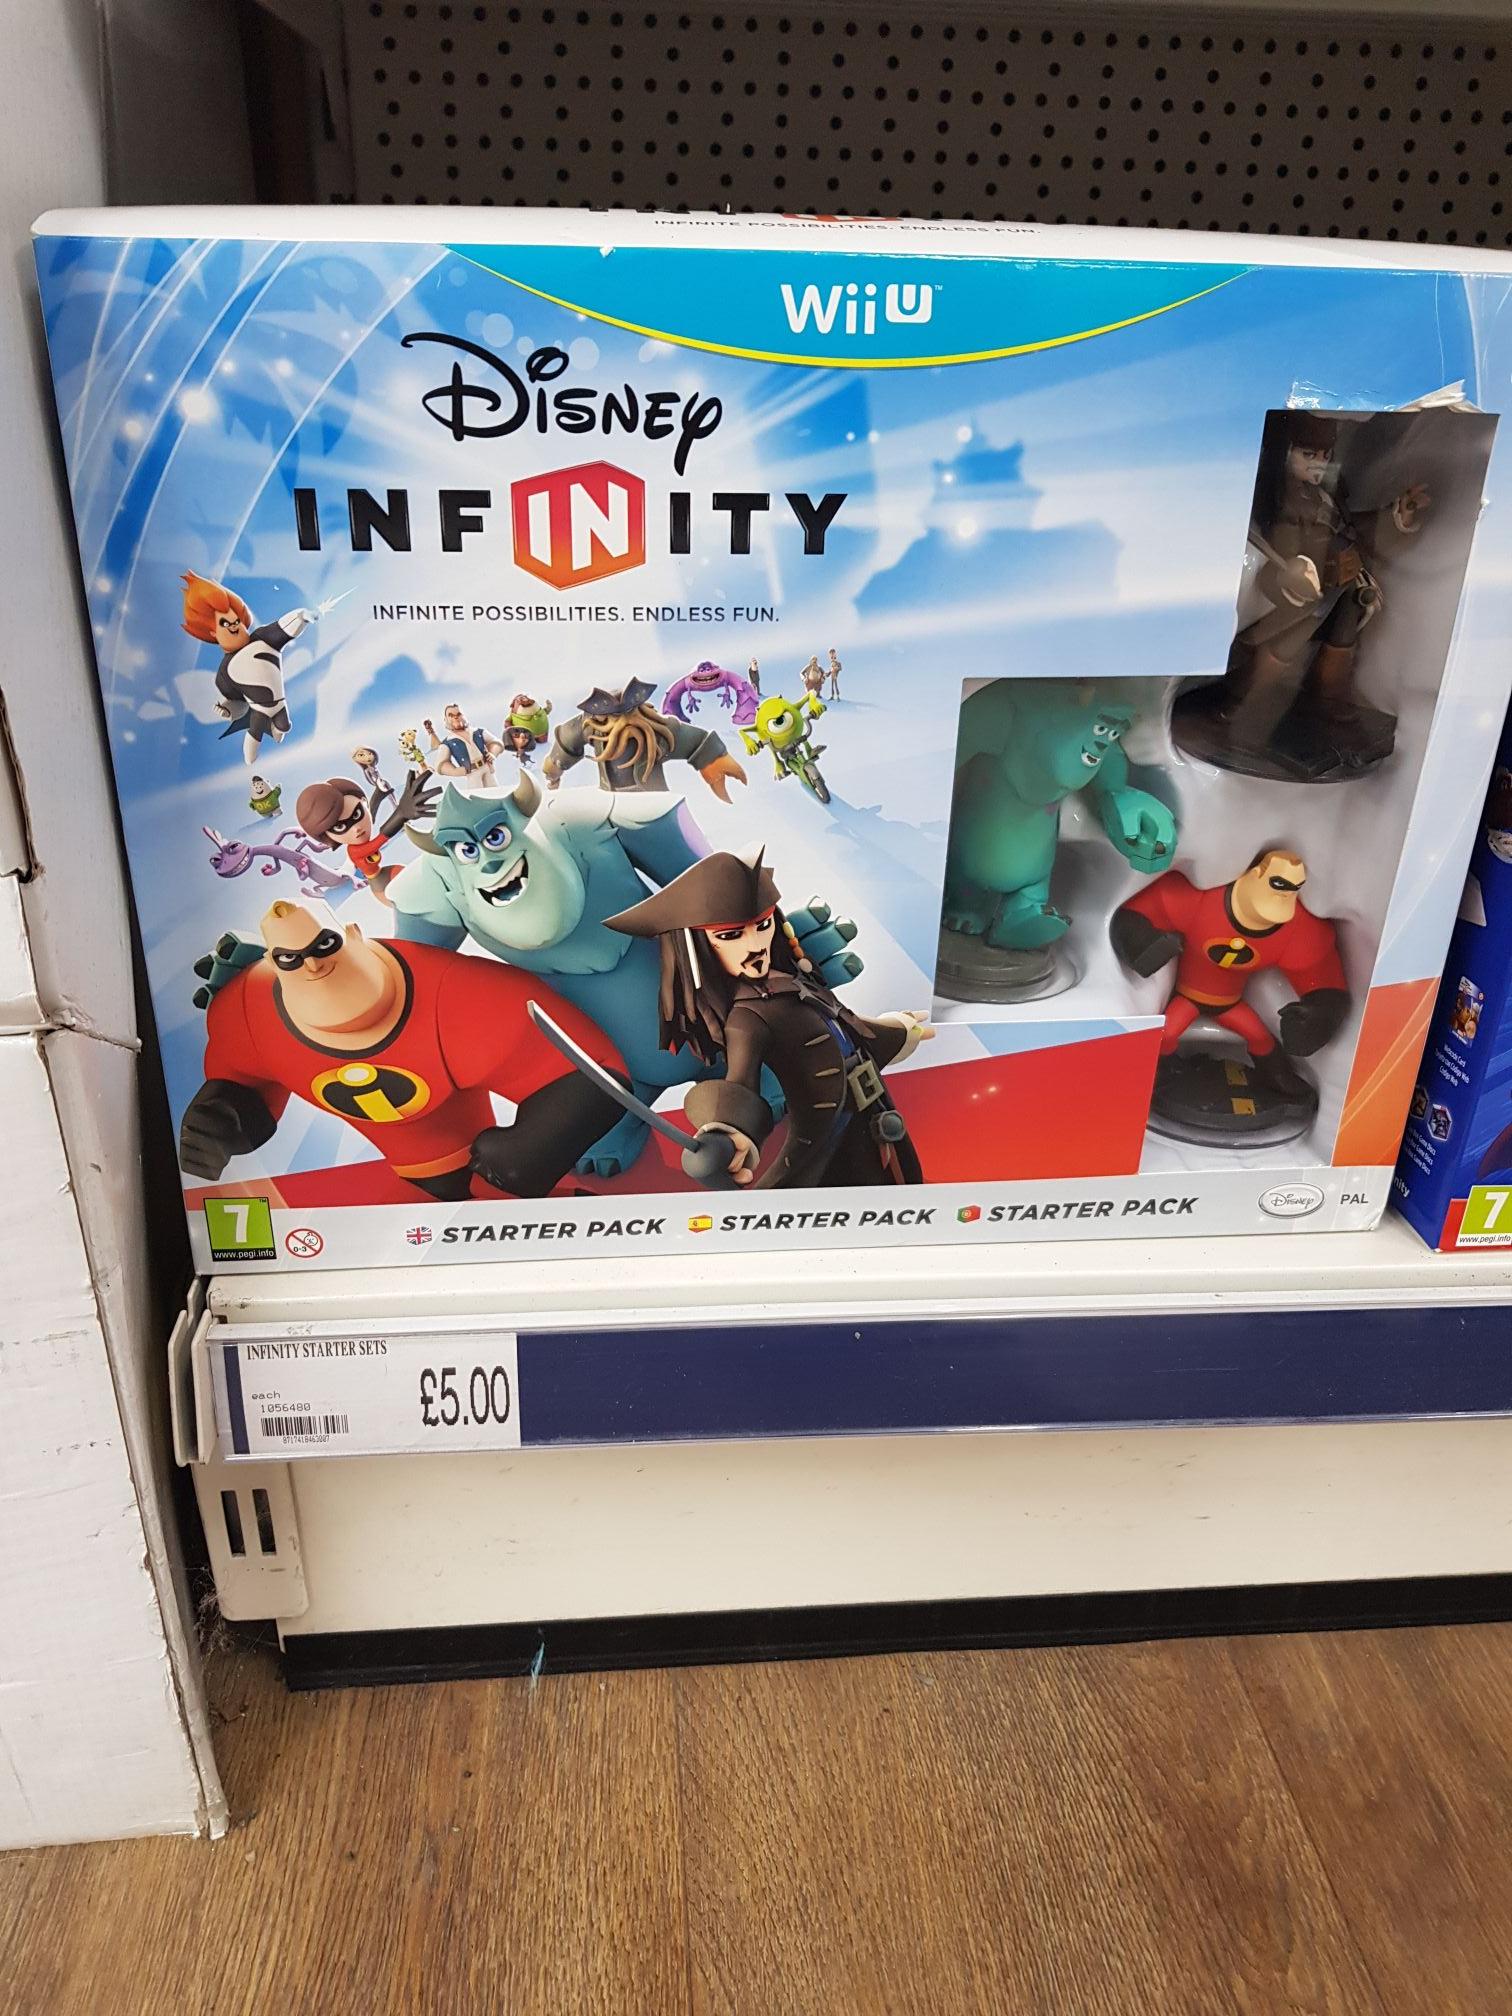 Disney infinity starter pack for Wii U £5 @ Poundworld Barnsley